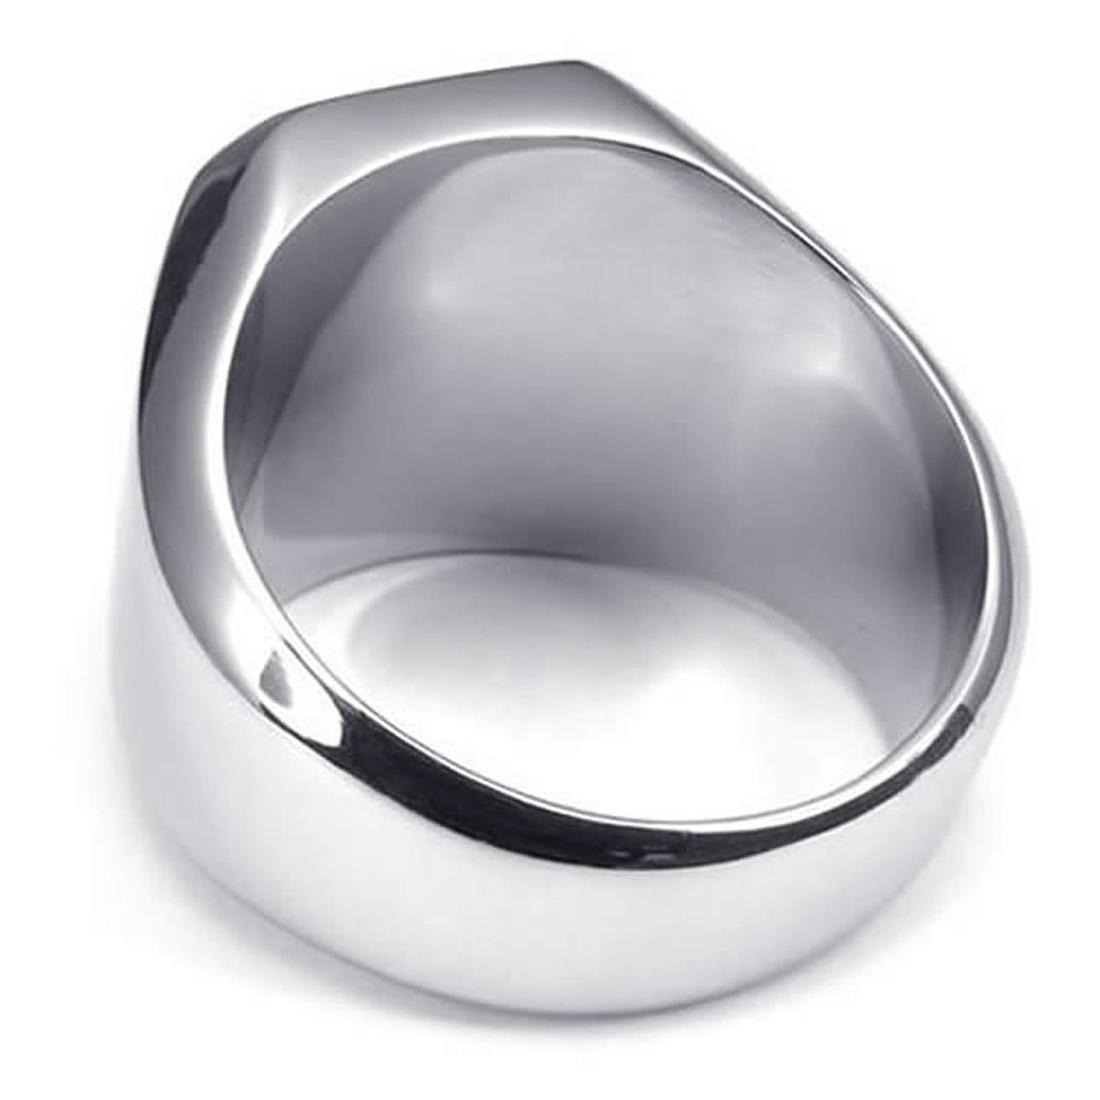 Schmuck HerrenRing Edelstahl Siegelring Silber DE  eBay